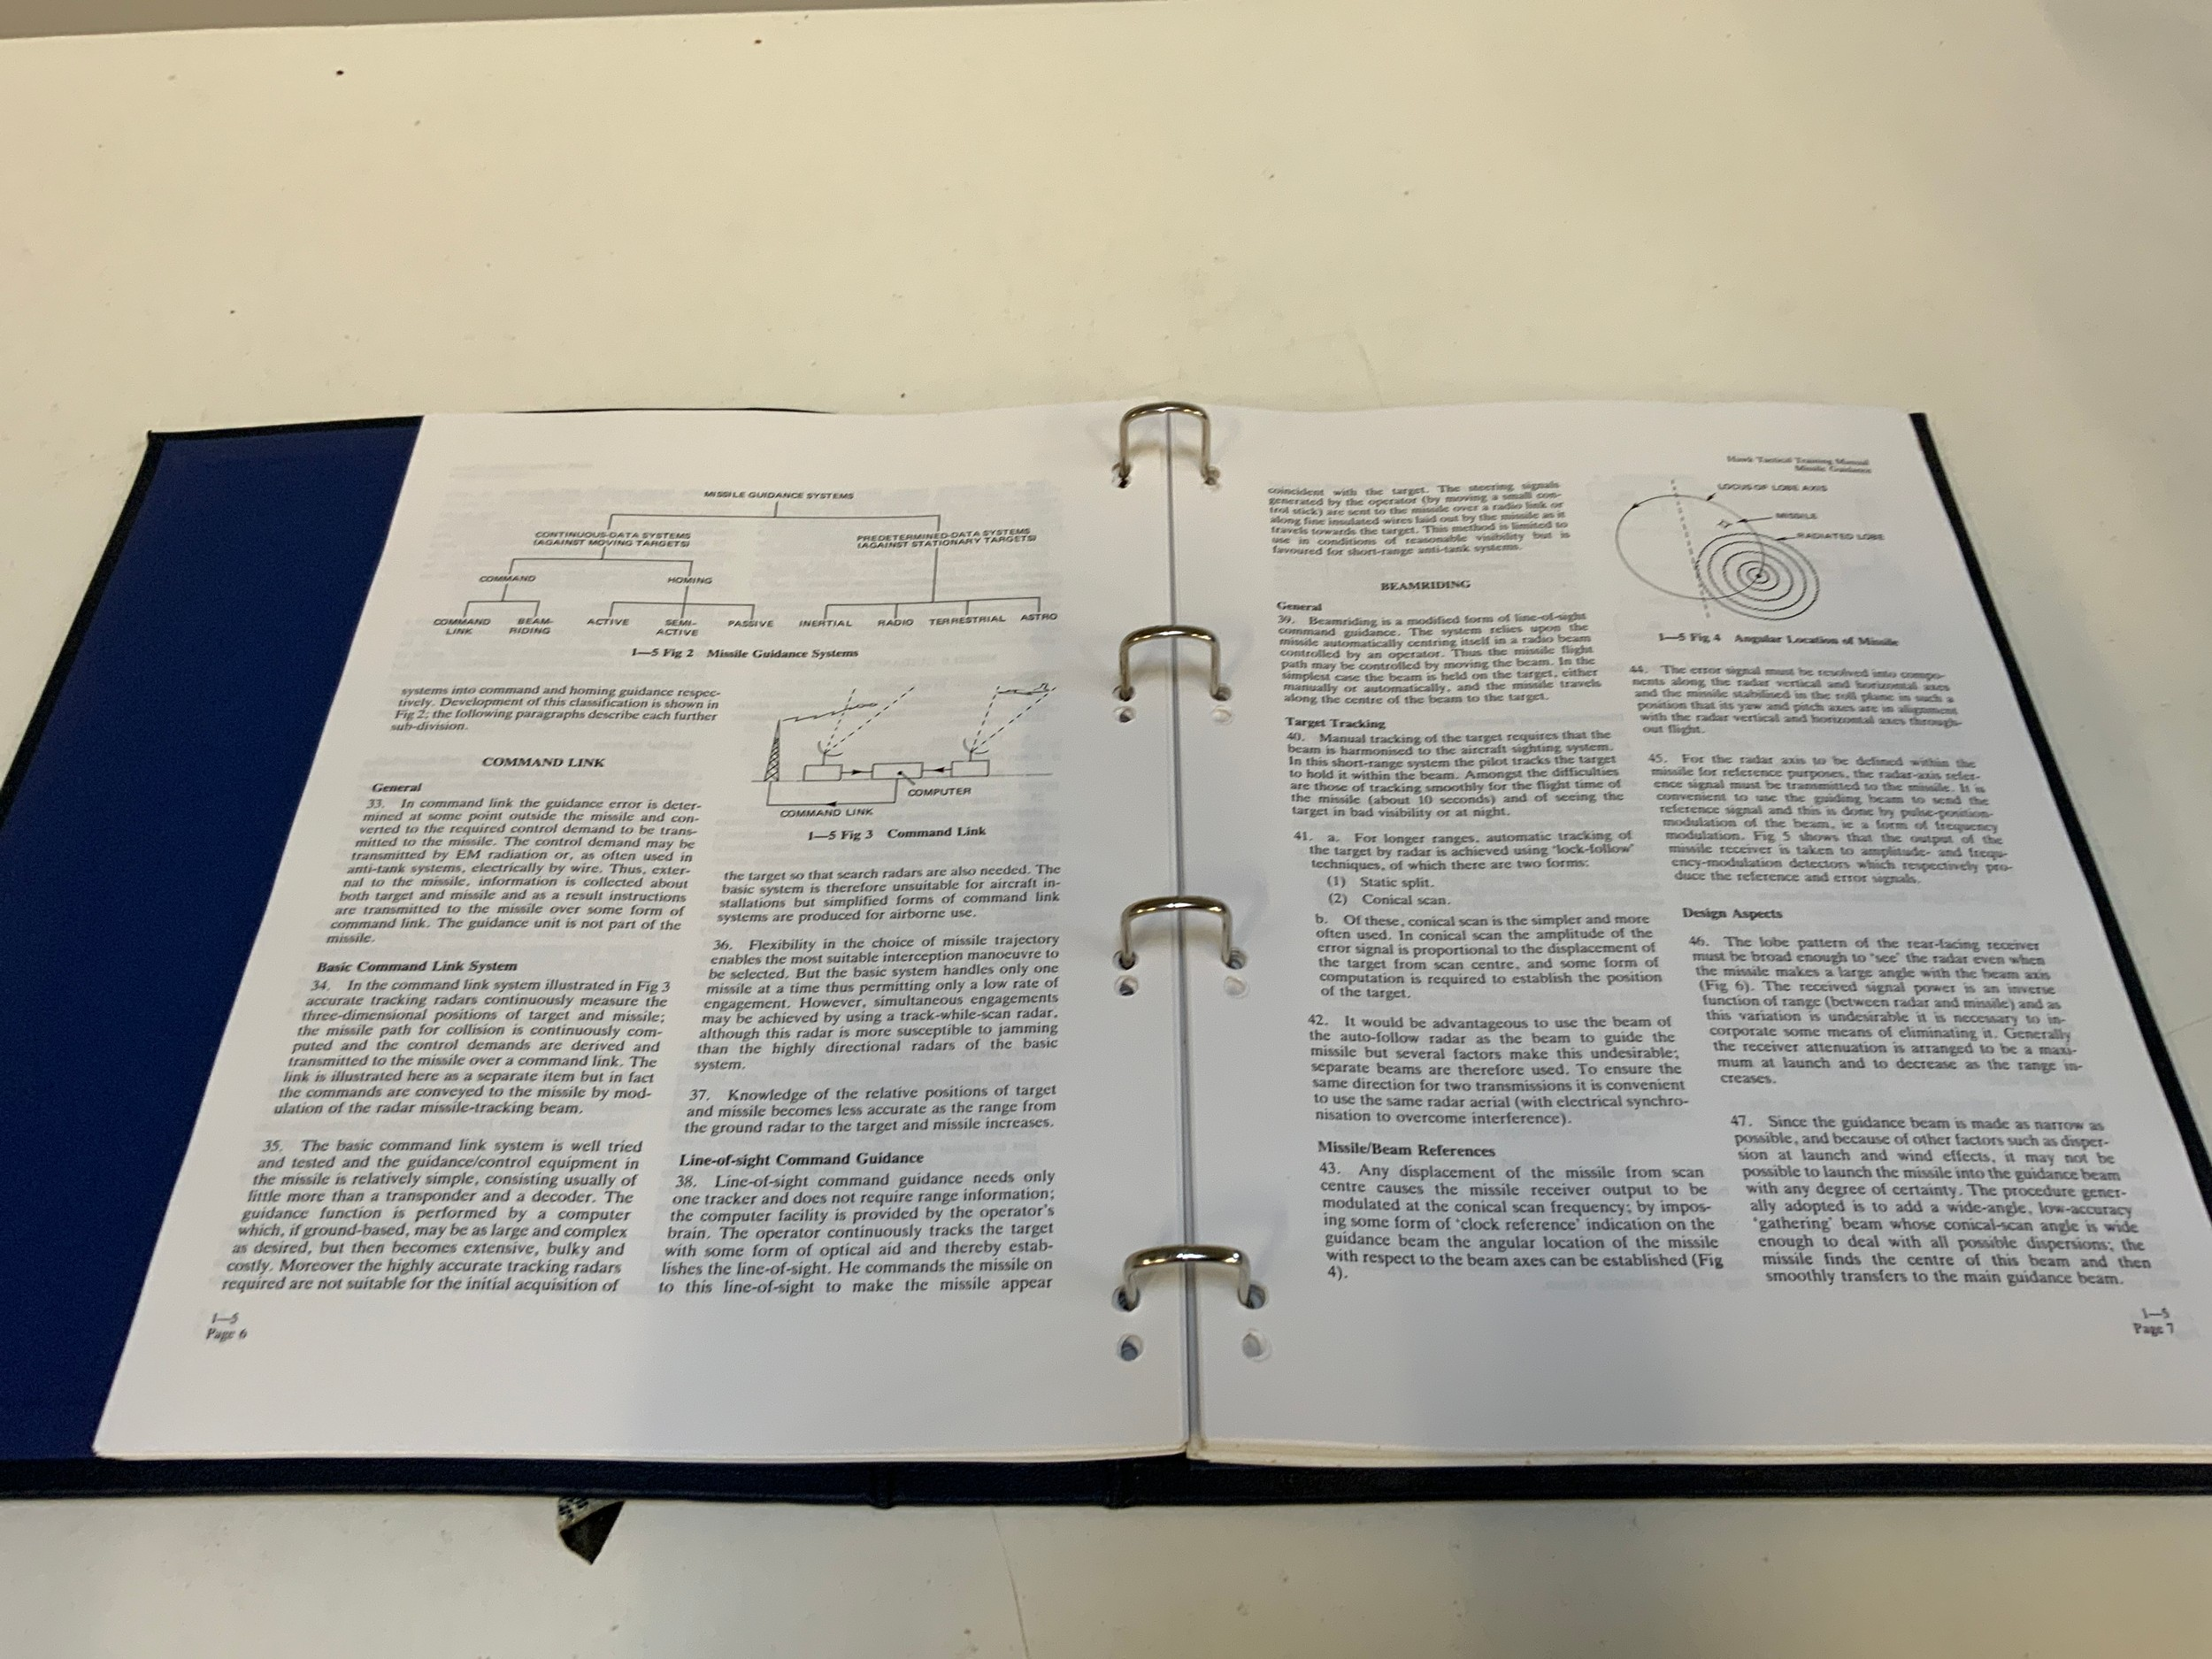 Hawk Aircraft Tactical Training Manual - Image 2 of 2